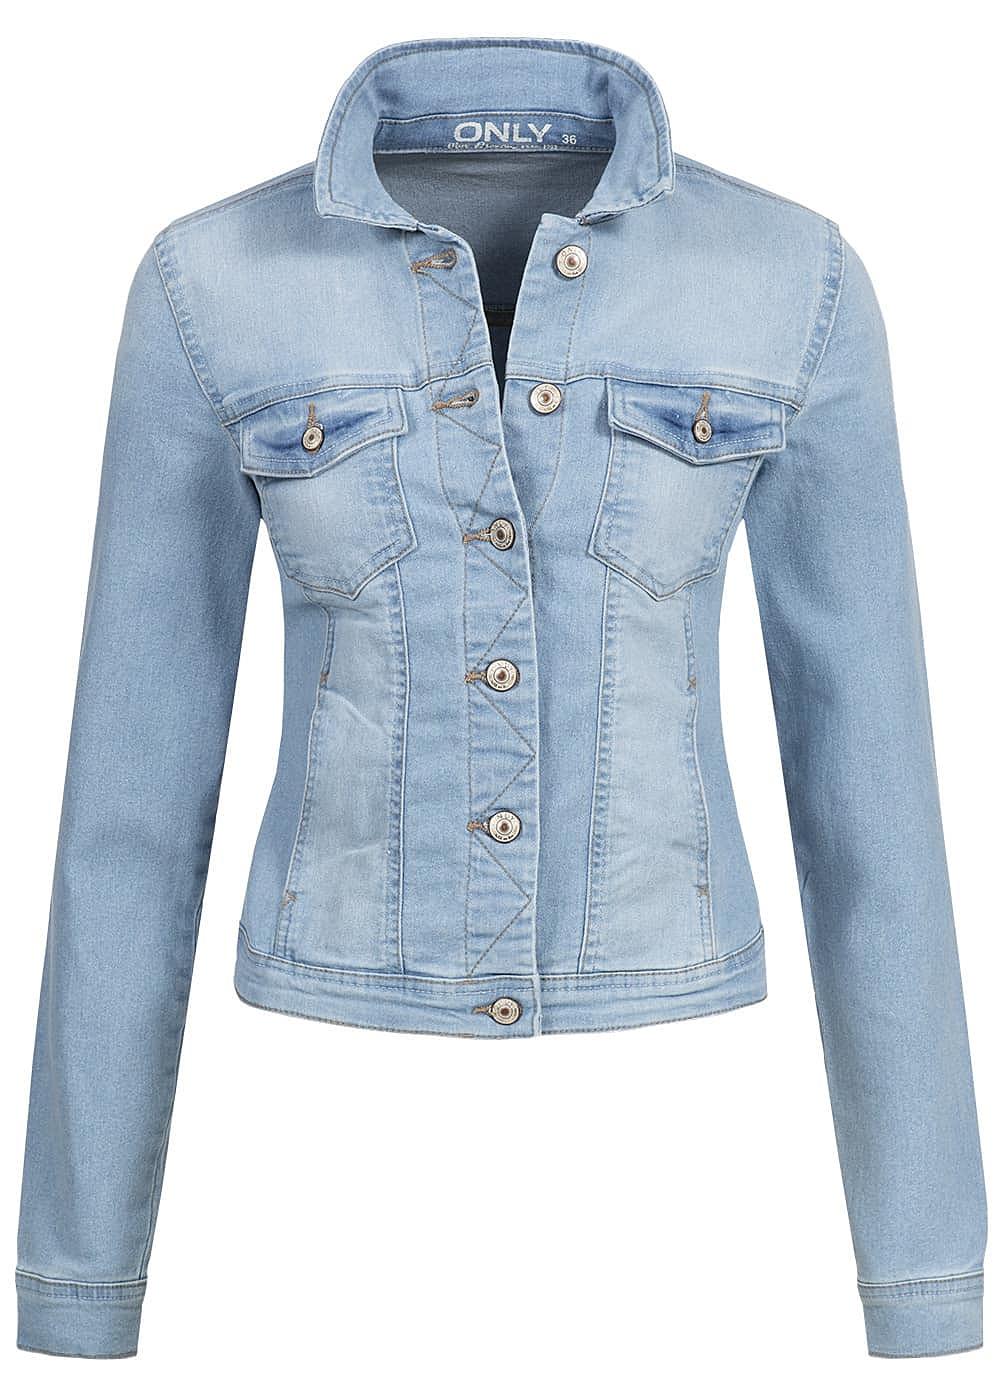 only damen jeans jacke noos 2 taschen 2 brusttaschen. Black Bedroom Furniture Sets. Home Design Ideas